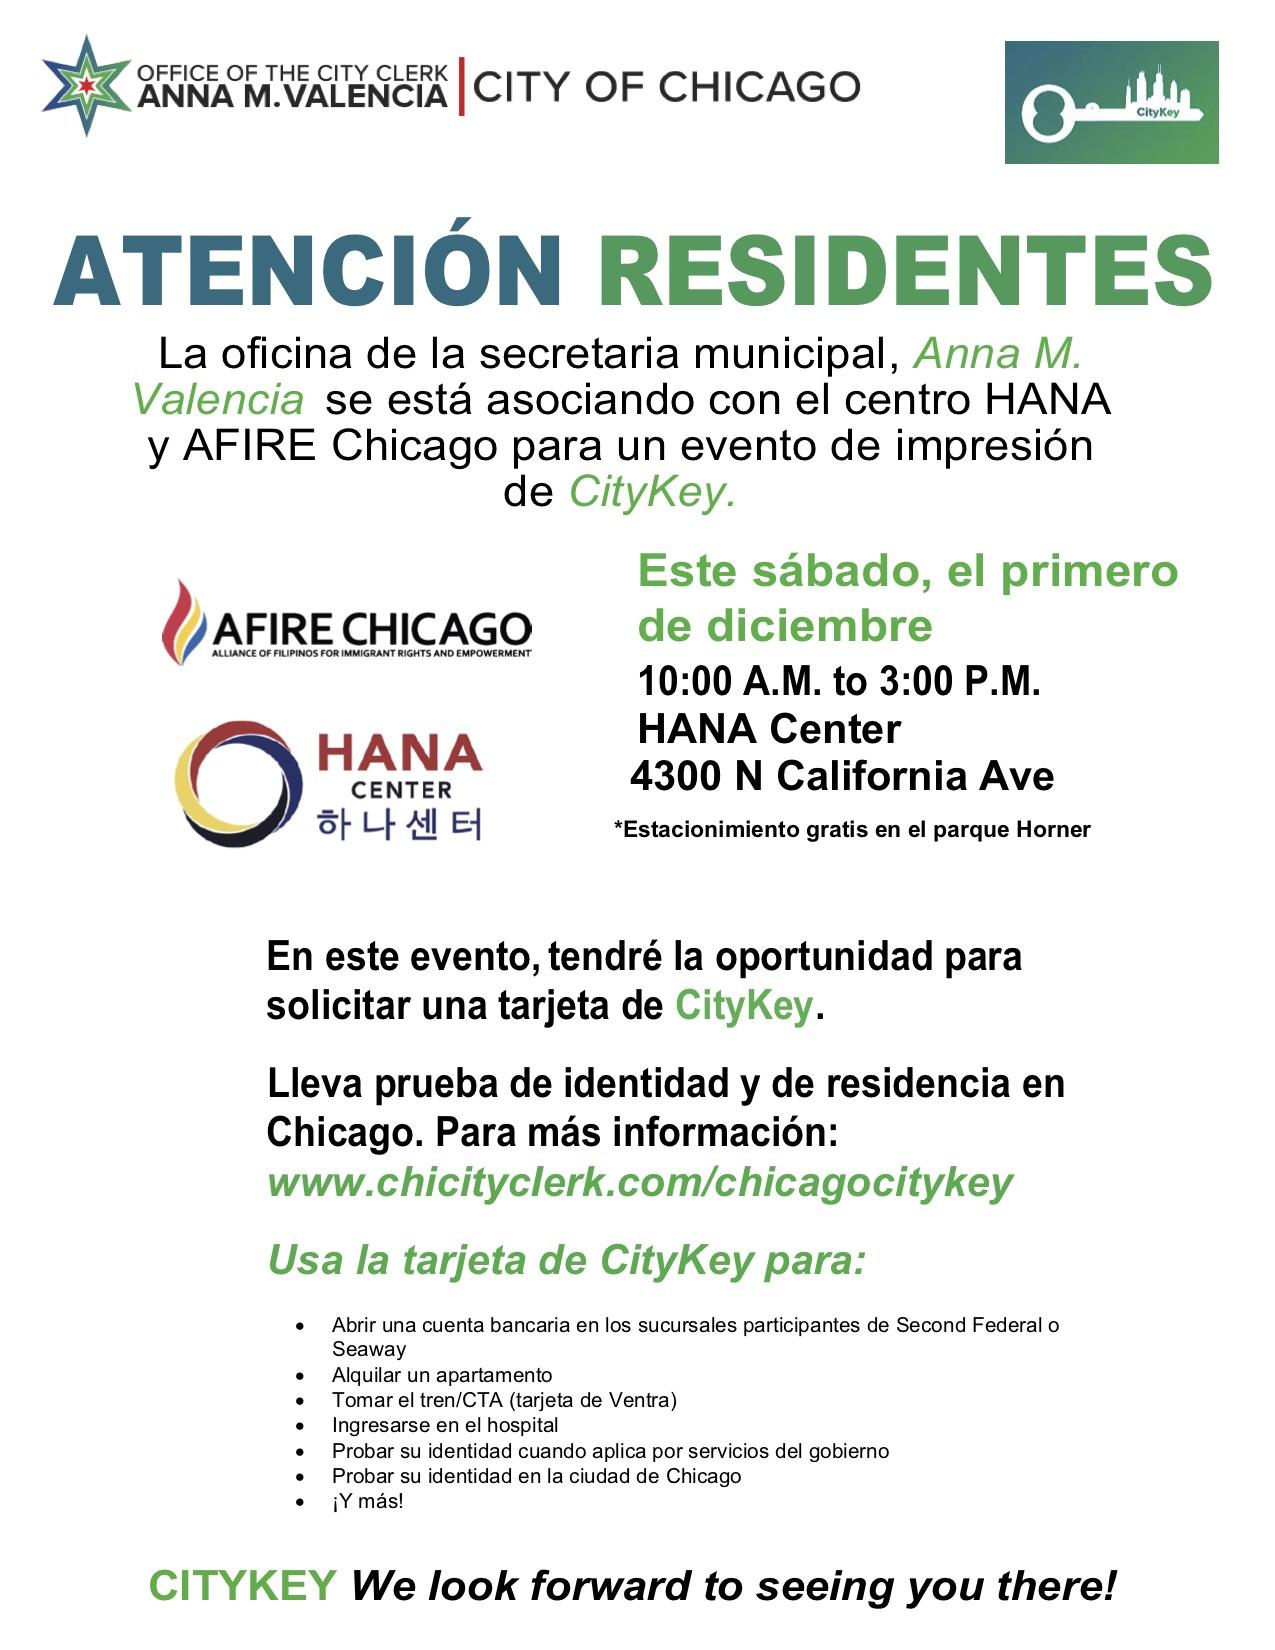 CityKey Printing Event Flyer Spanish.jpg